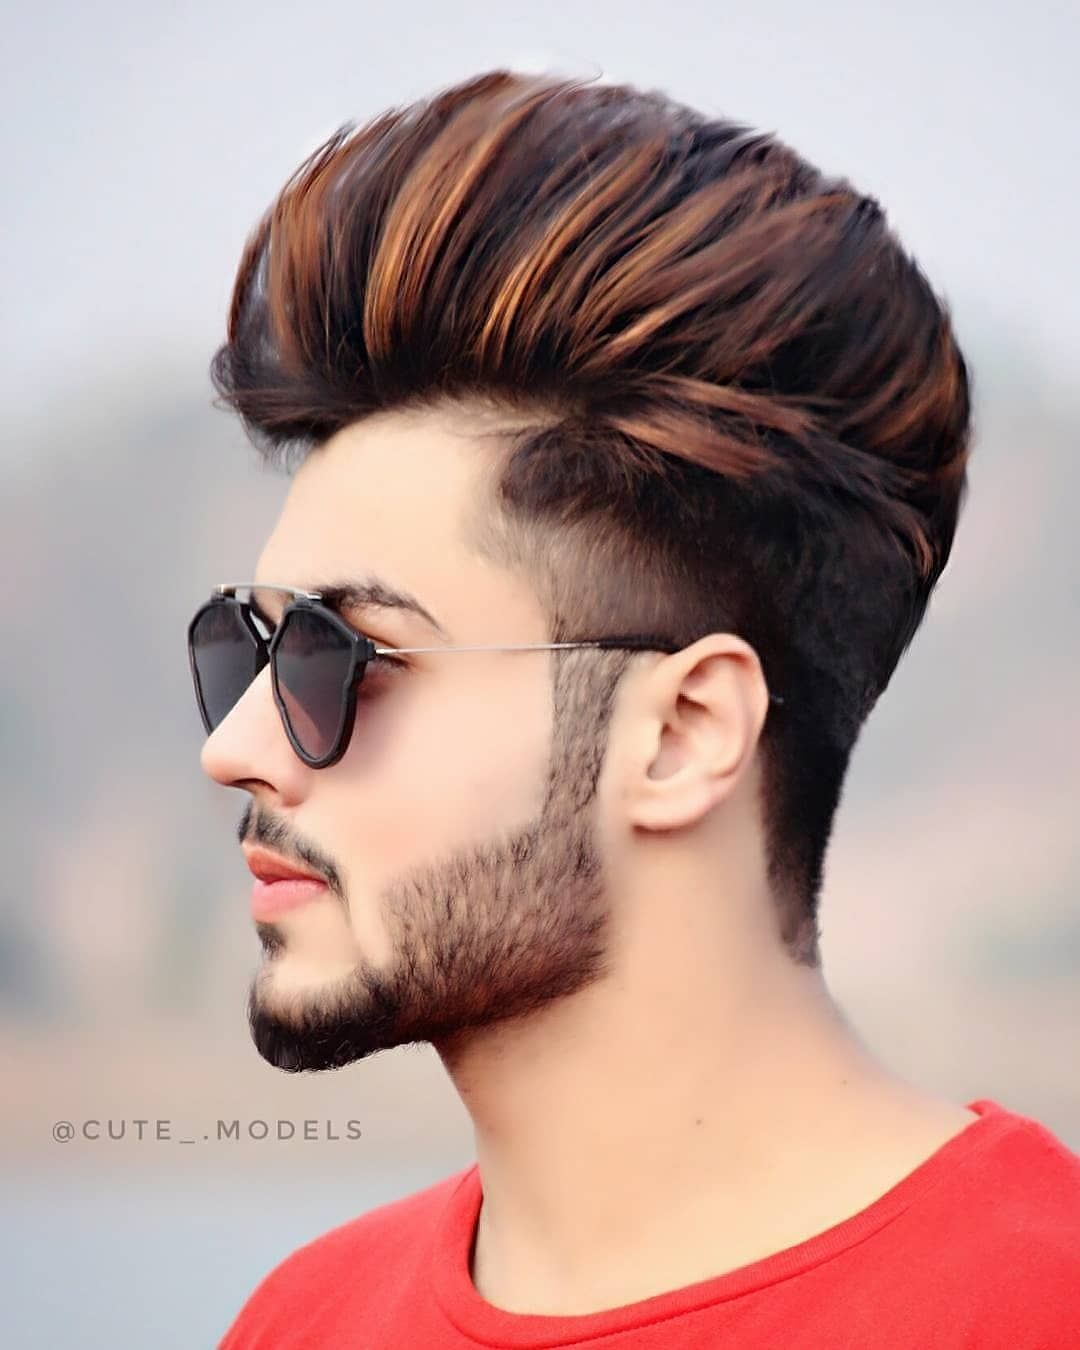 Boys Trending Hair Style 1080x1350 Download Hd Wallpaper Wallpapertip